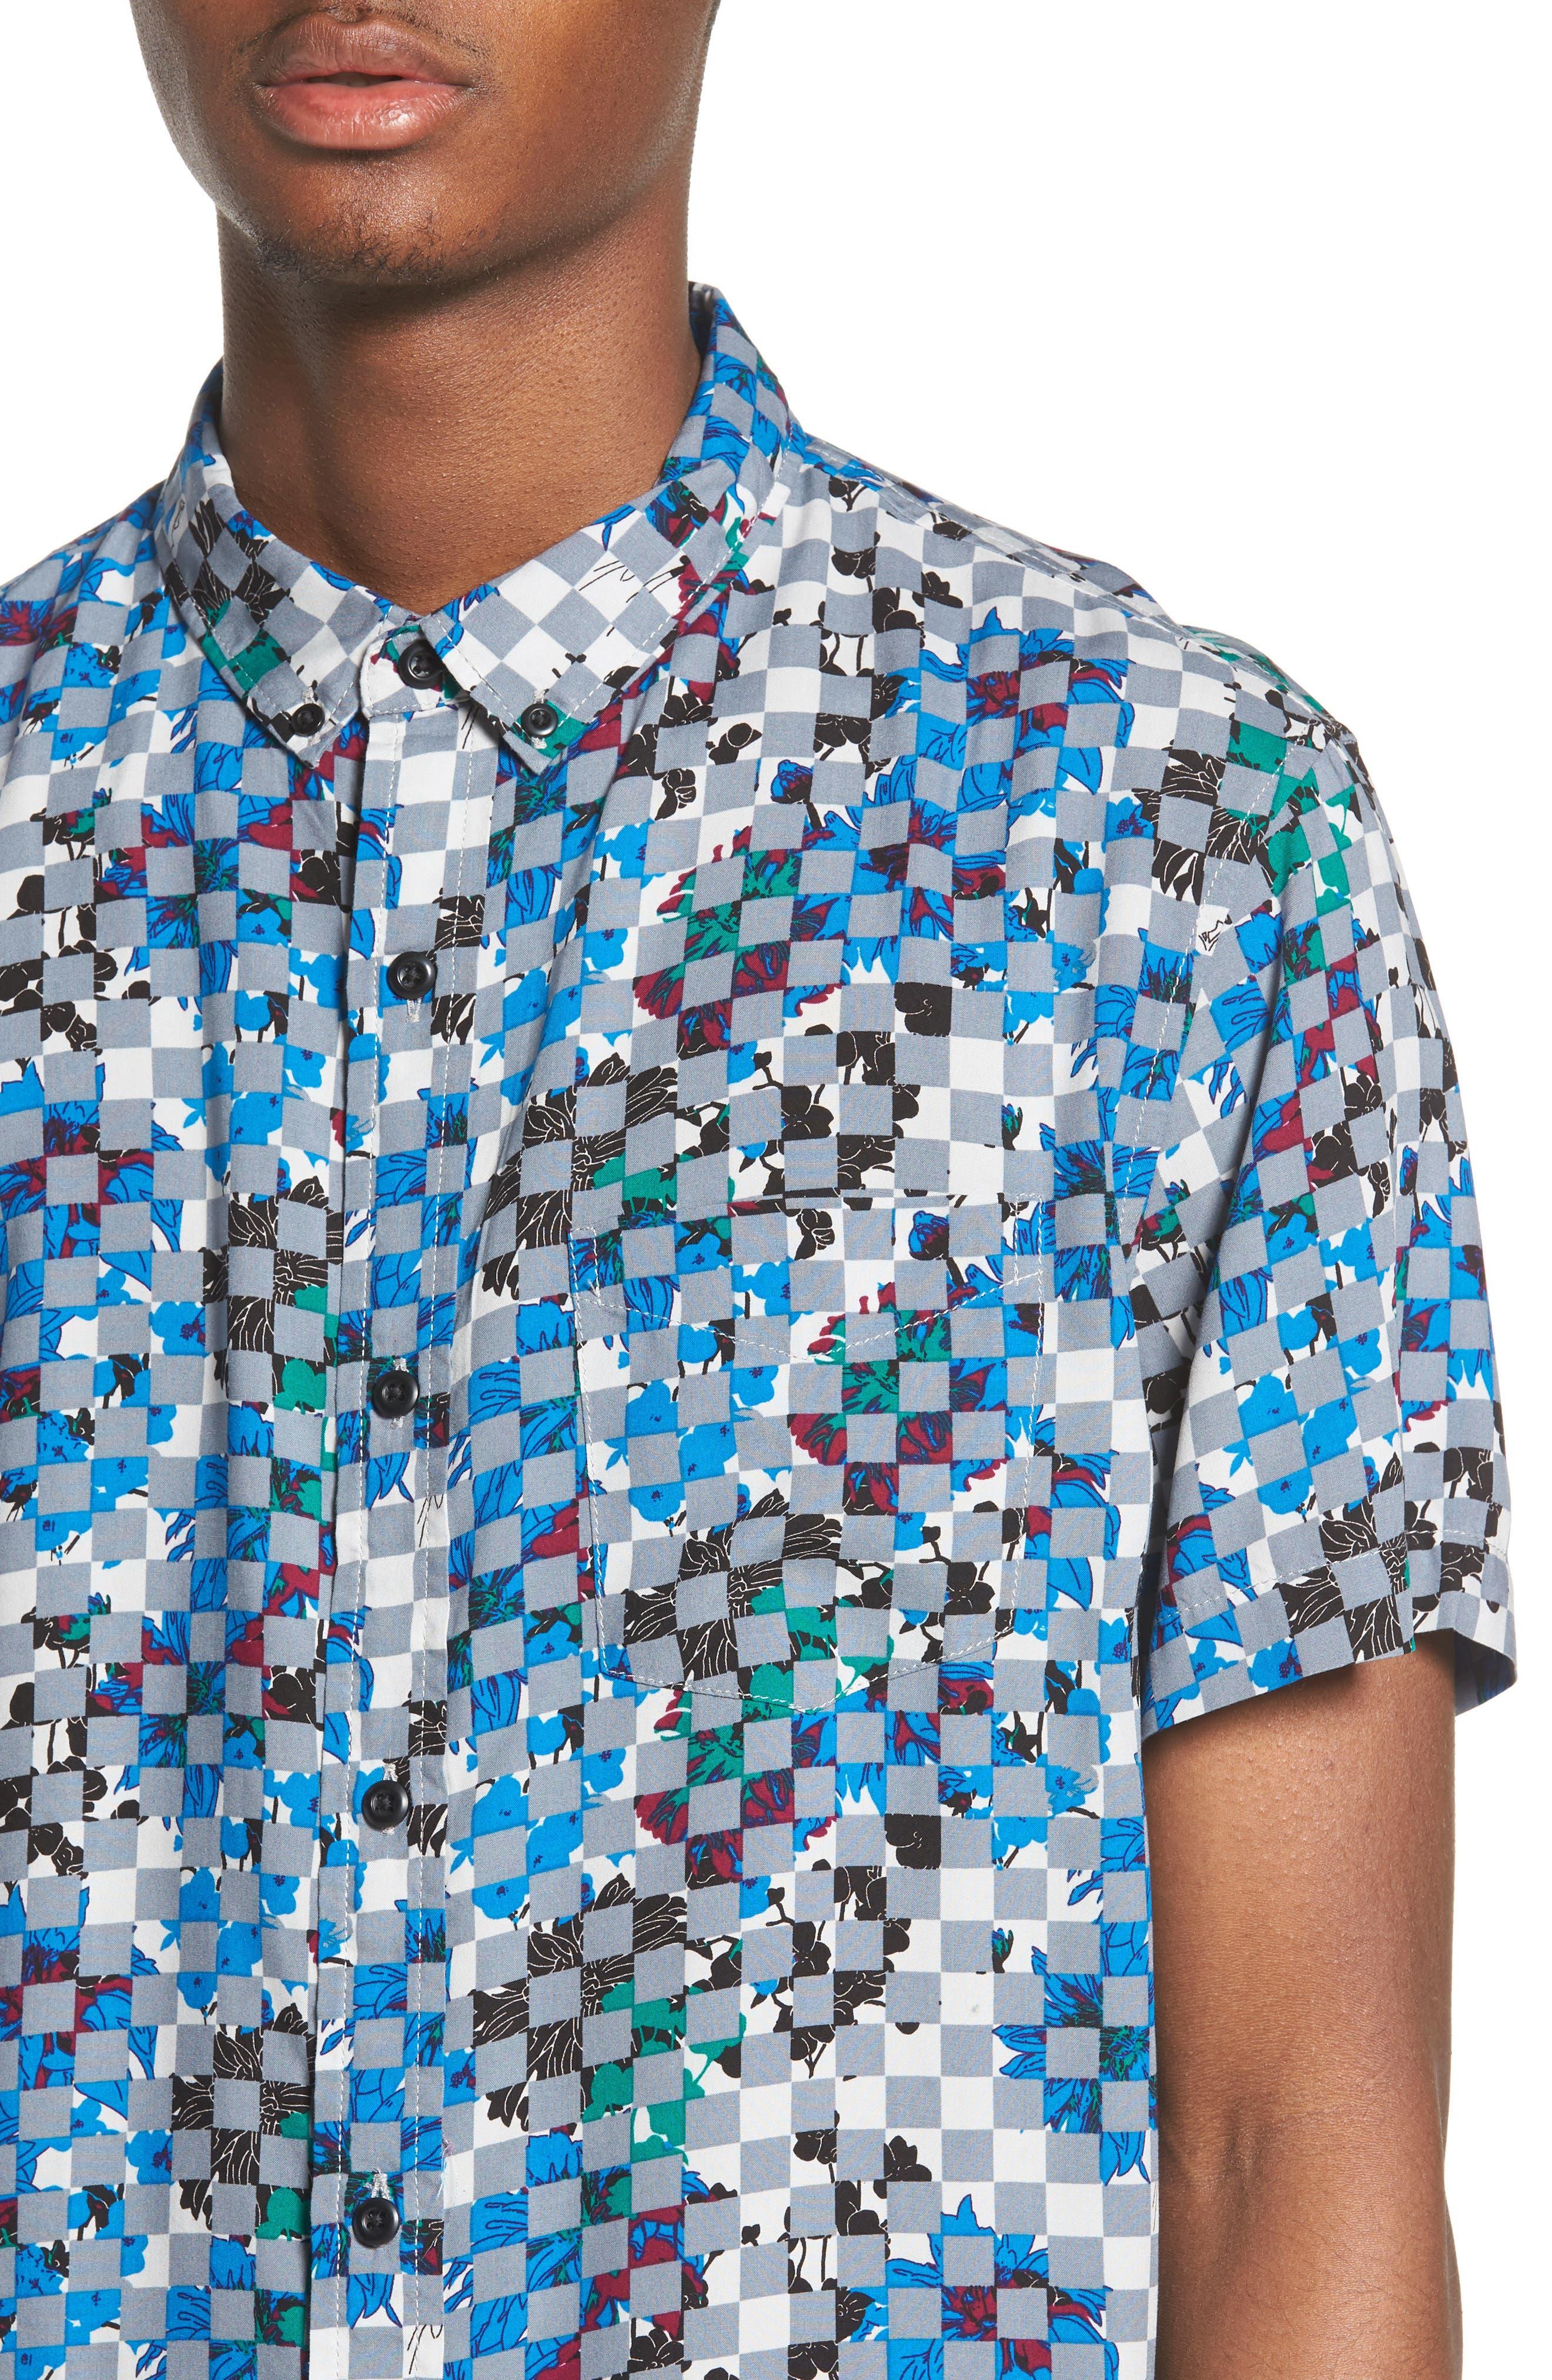 Woven Print Shirt,                             Alternate thumbnail 2, color,                             Grey Checker Board Floral